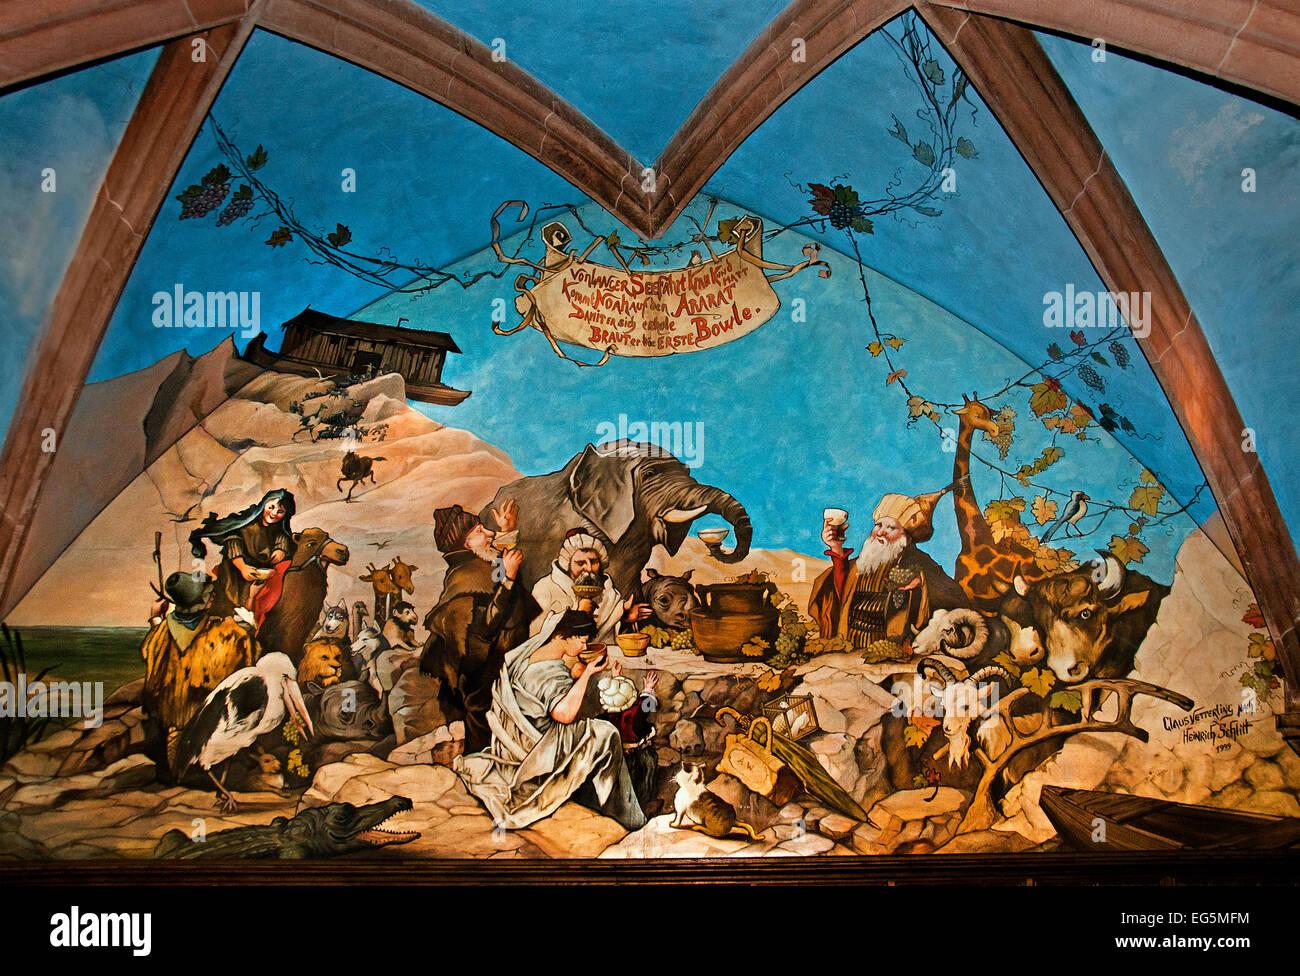 Ratskeller Restaurant Fresco Mural Painting  Munich German Germany - Stock Image